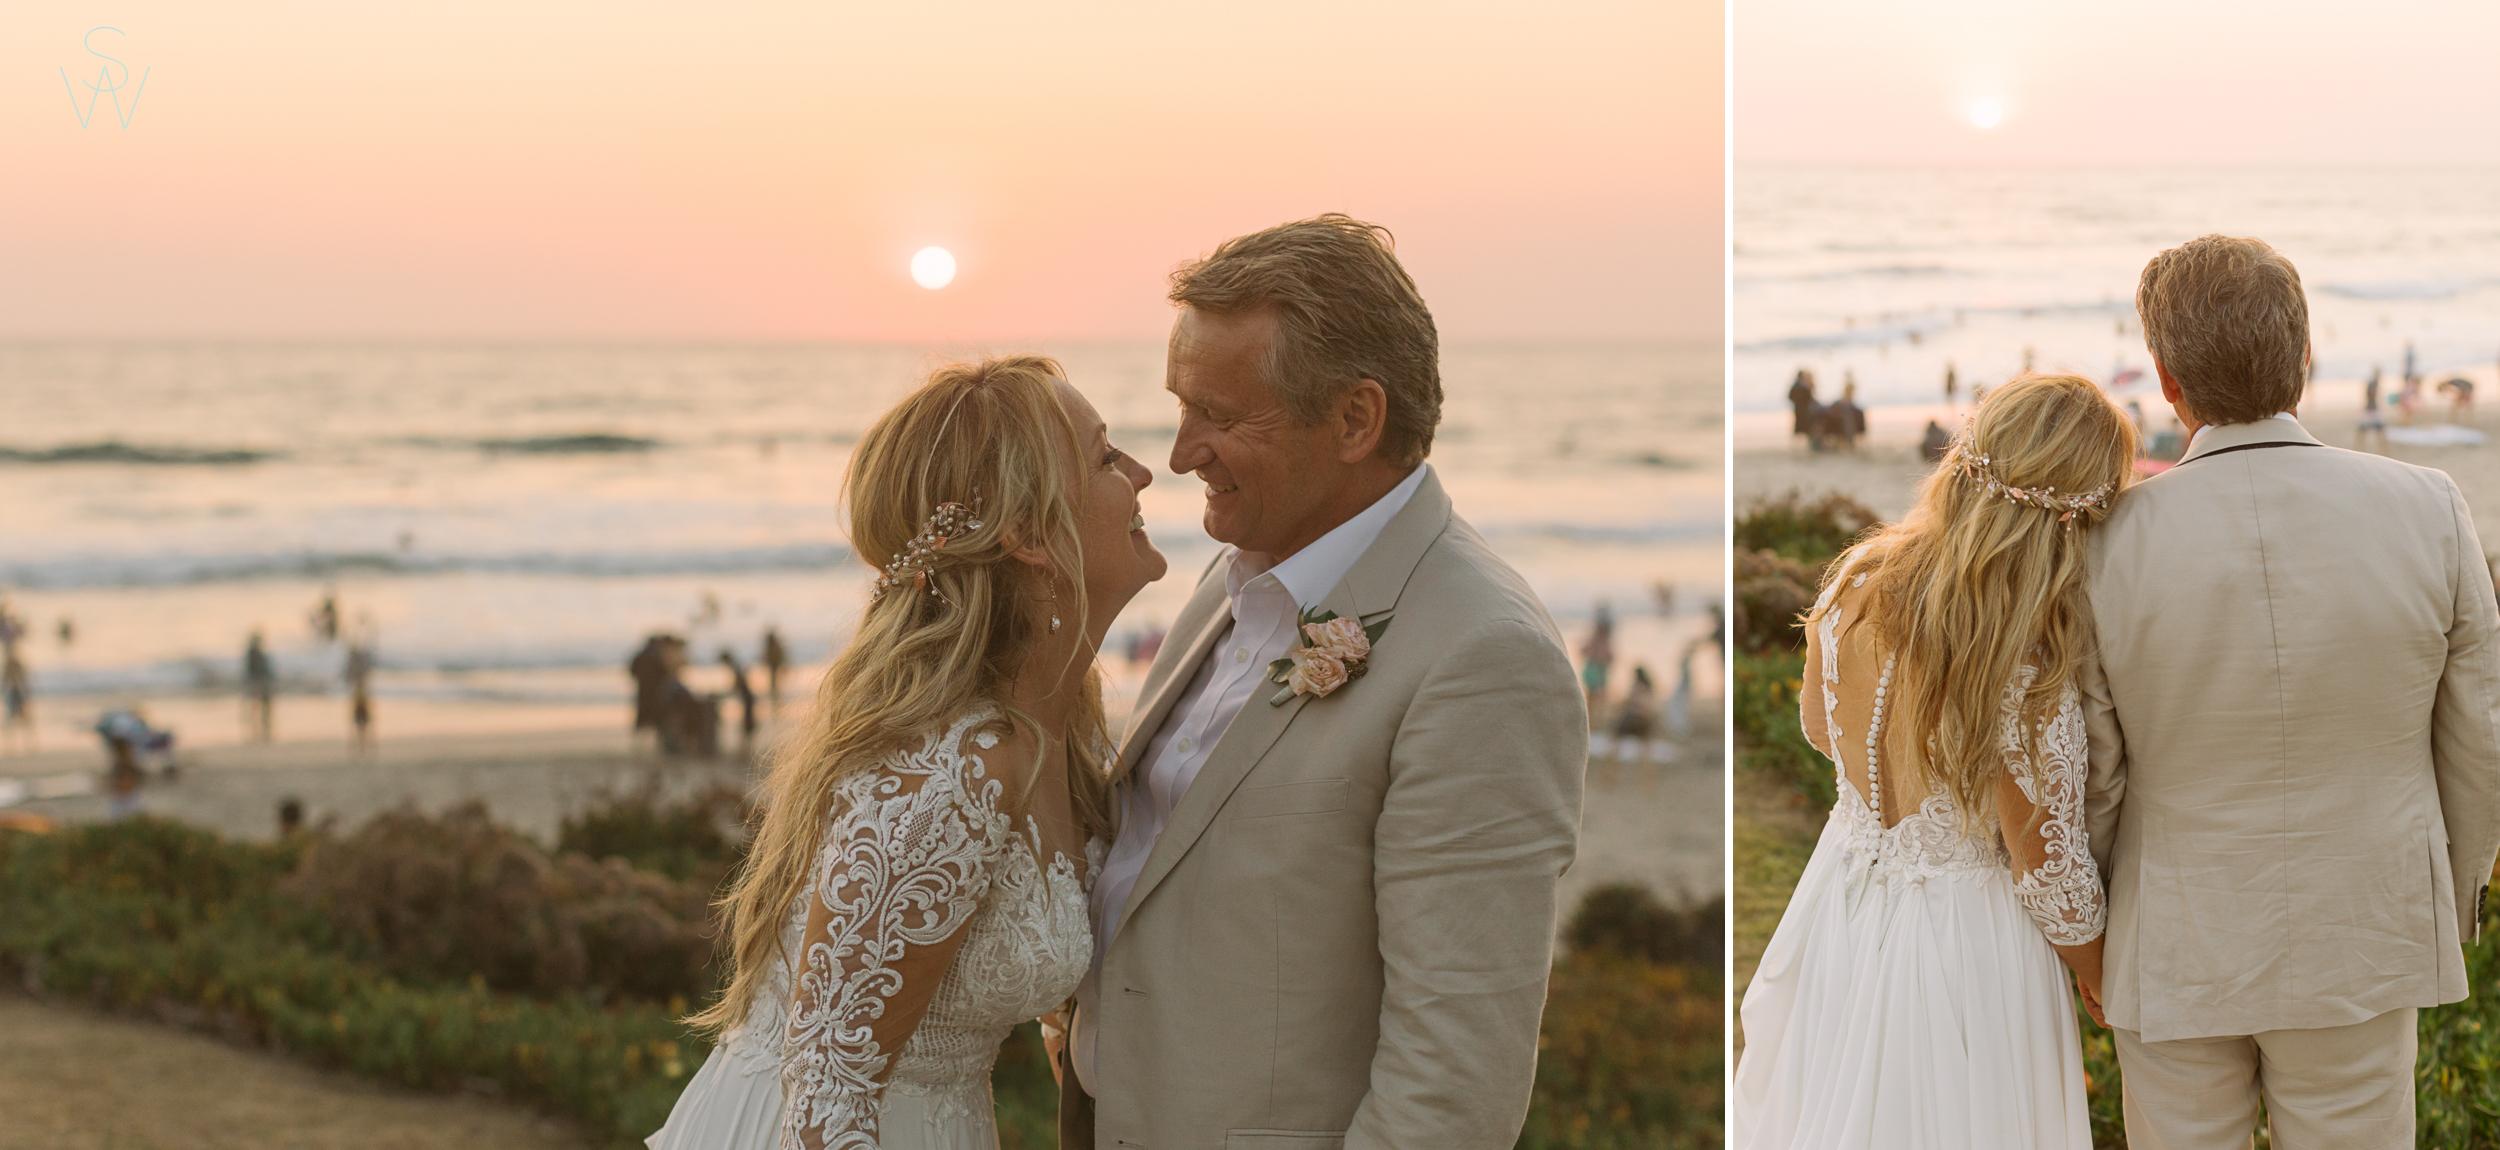 160DEL.MAR.WEDDINGS.sunsetromantics.photography.shewanders.JPG